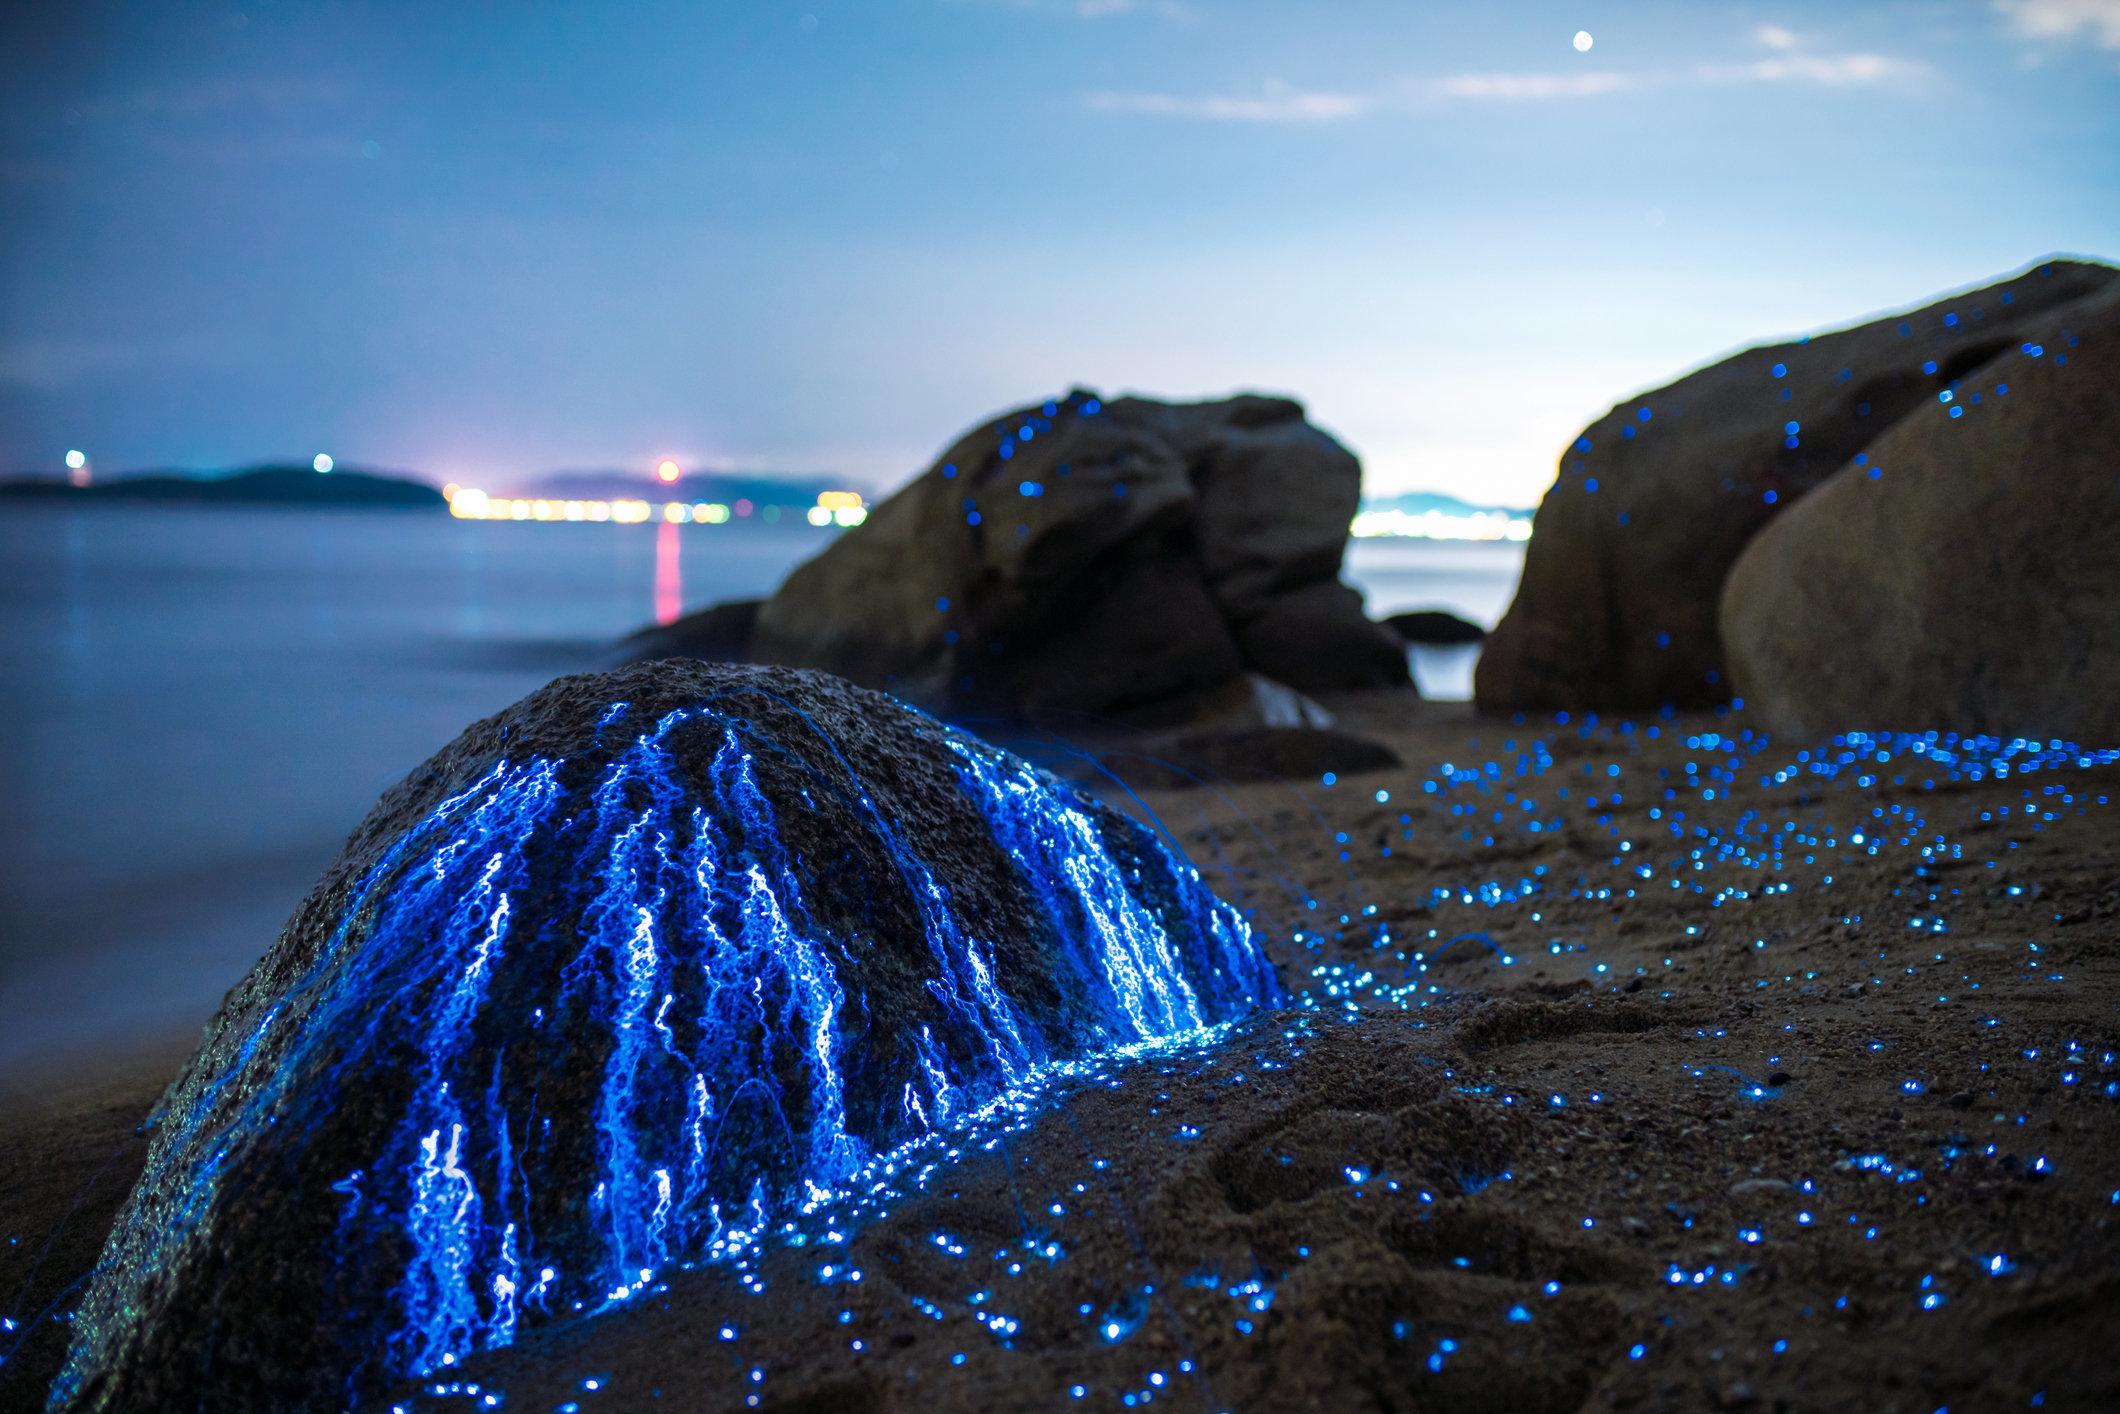 Bioluminescent sea fireflies glittering like diamonds on the rocks and sand. Okayama, Japan. July 2016